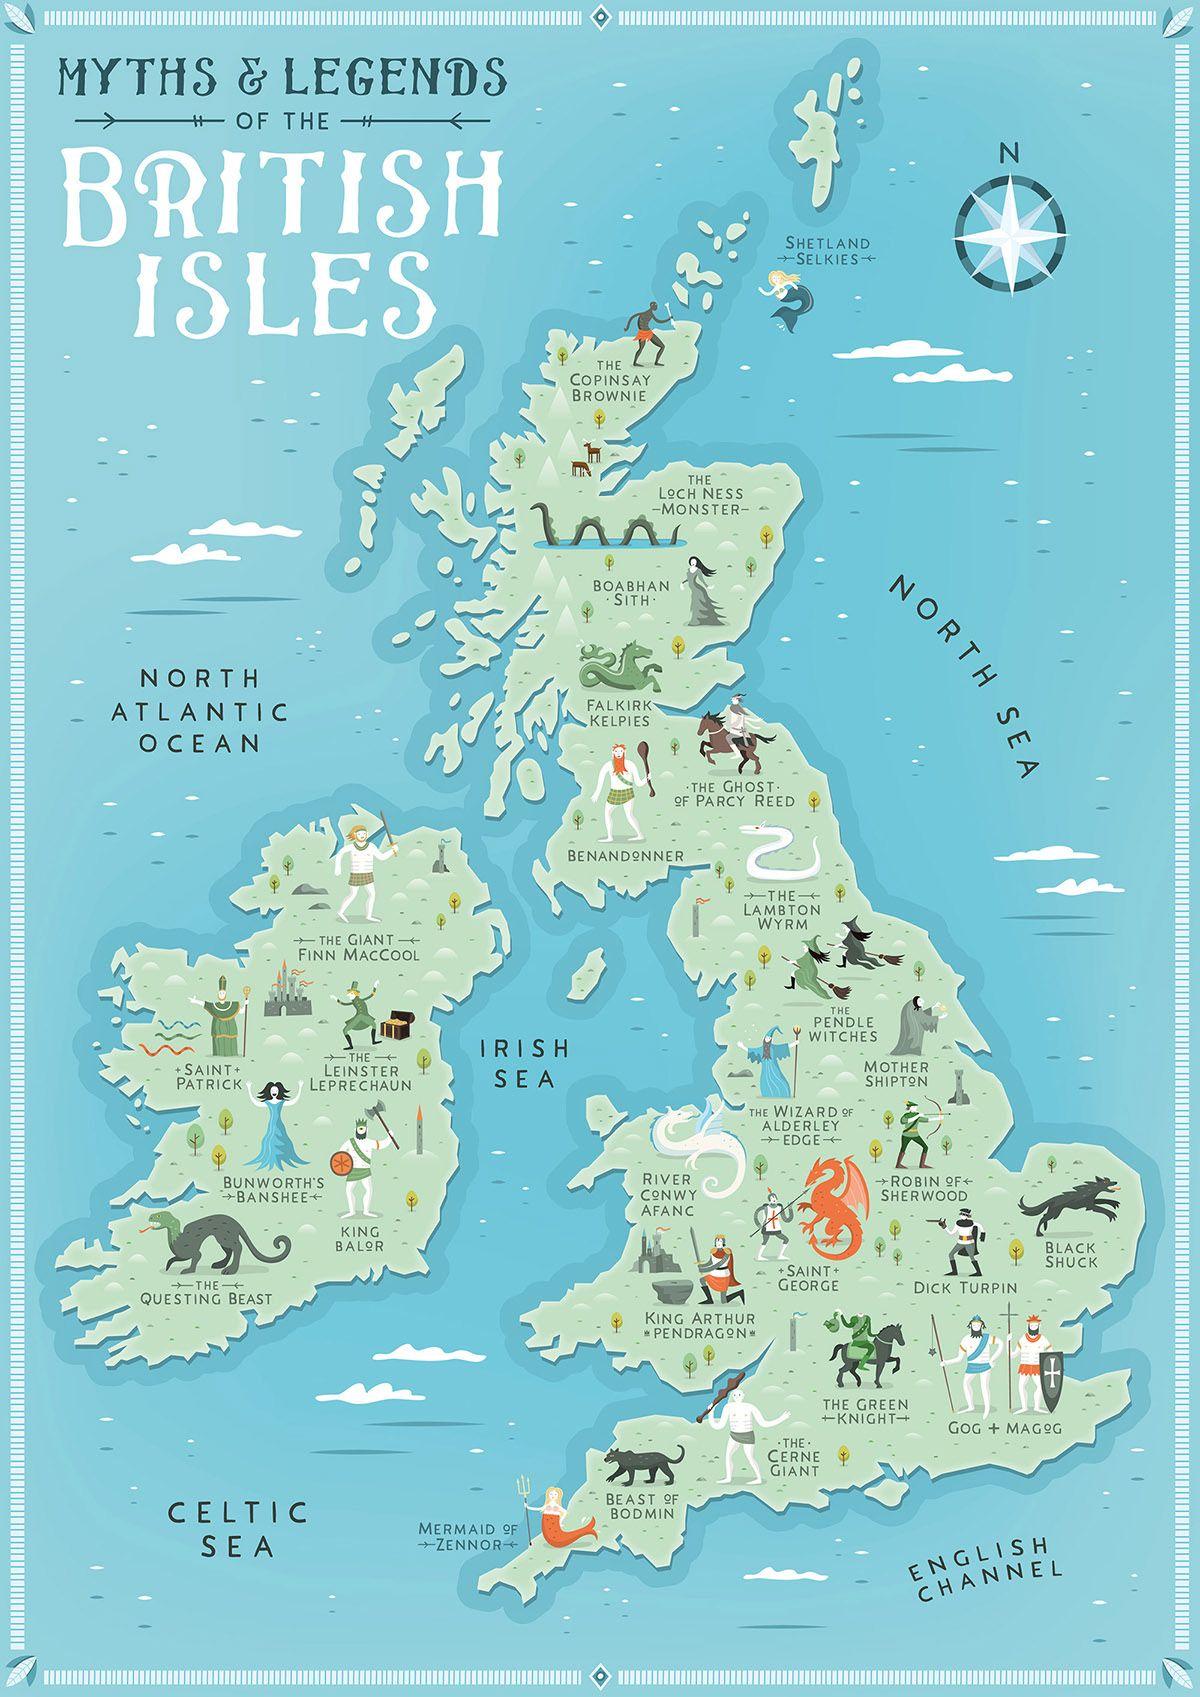 Myths & Legends of the British Isles Map #britishisles